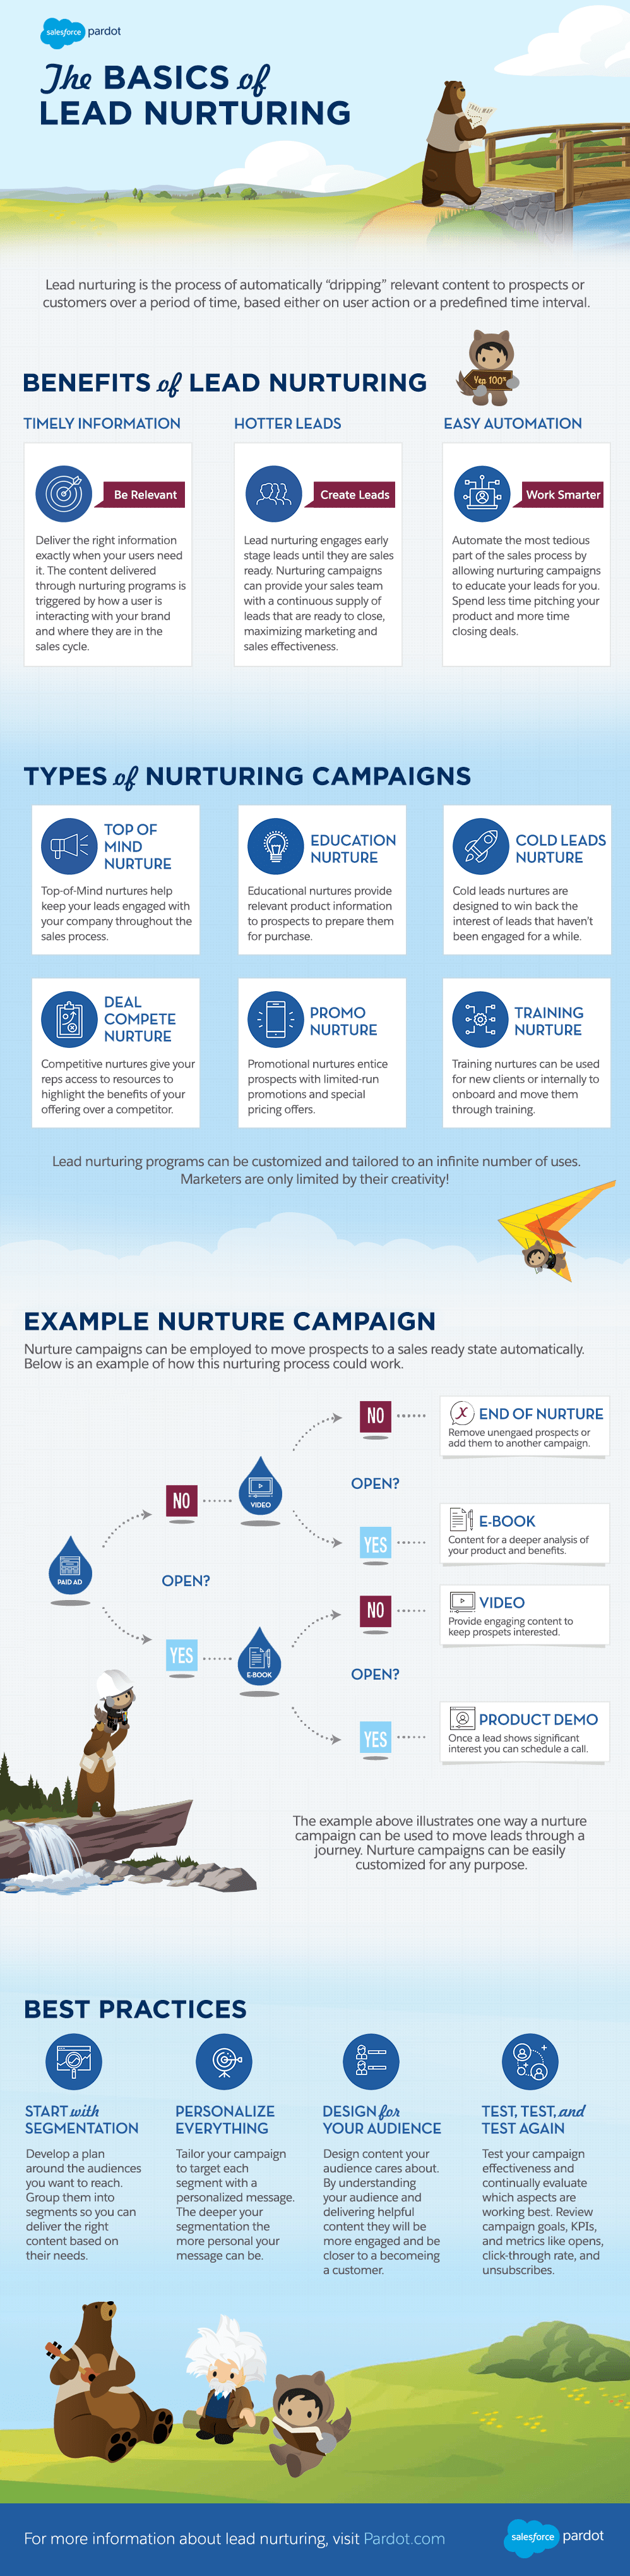 The Basics of Lead Nurturing [INFOGRAPHIC]